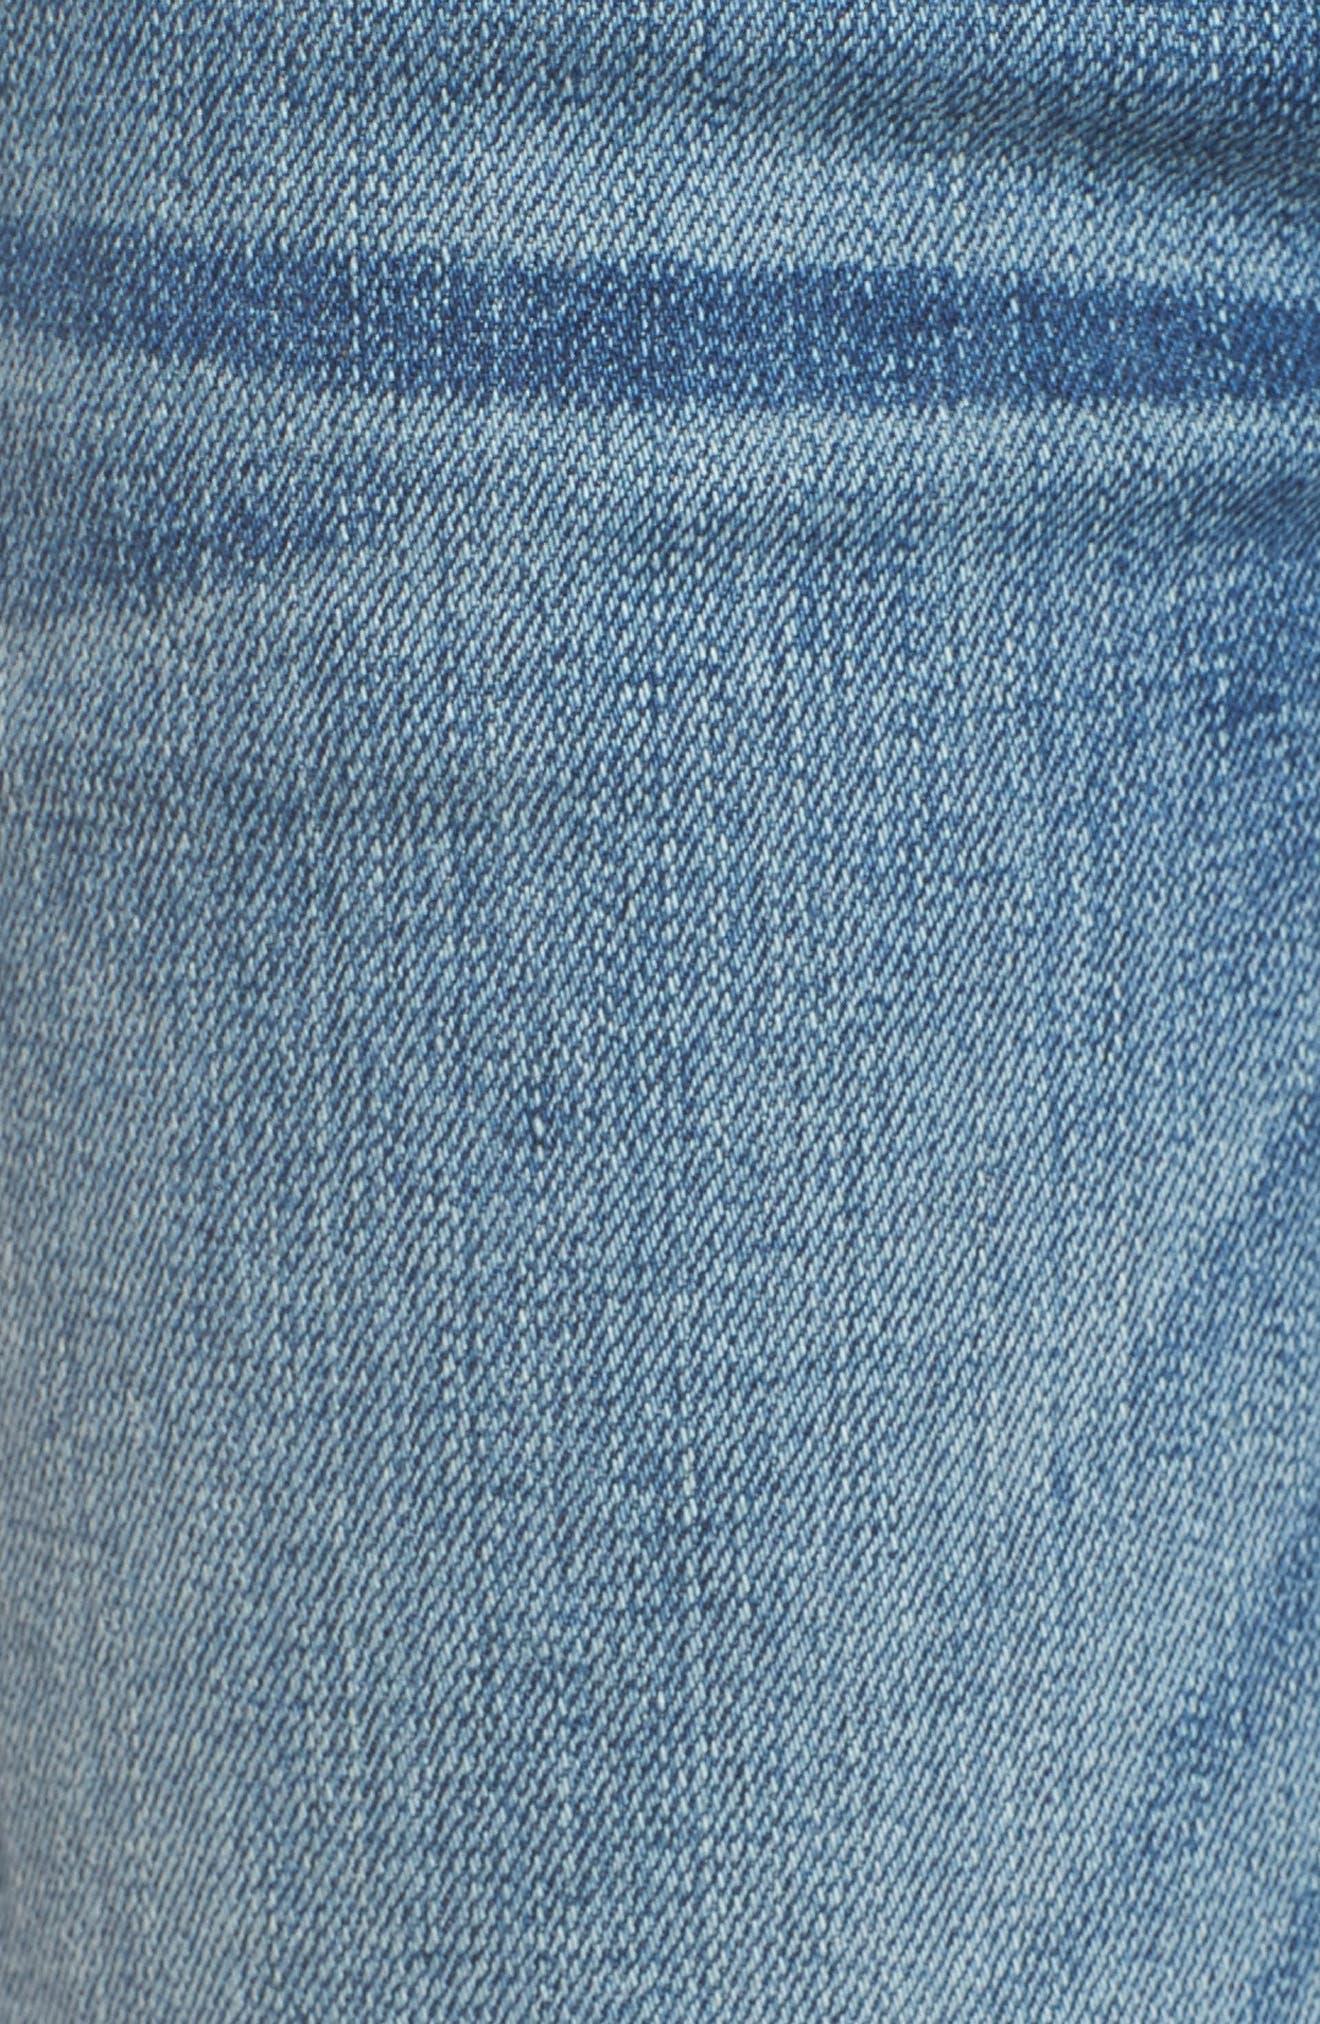 Hudson Collin Skinny Jeans,                             Alternate thumbnail 6, color,                             Hushed